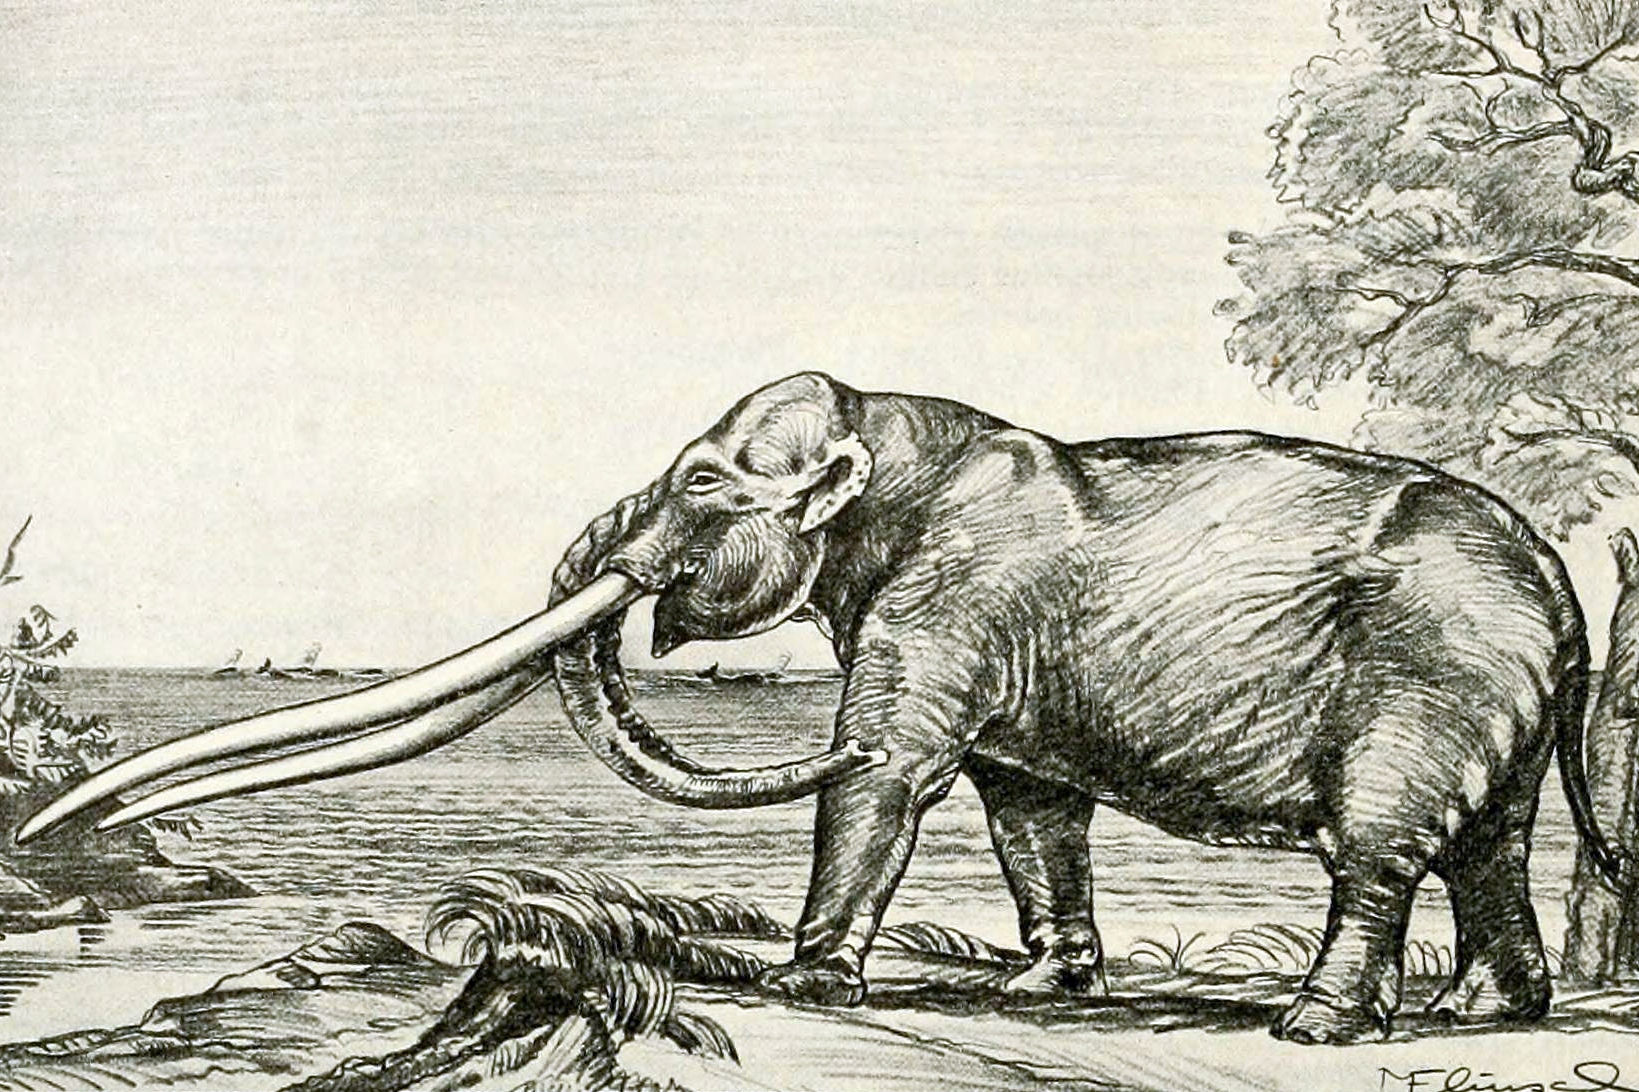 Depiction of Anancus